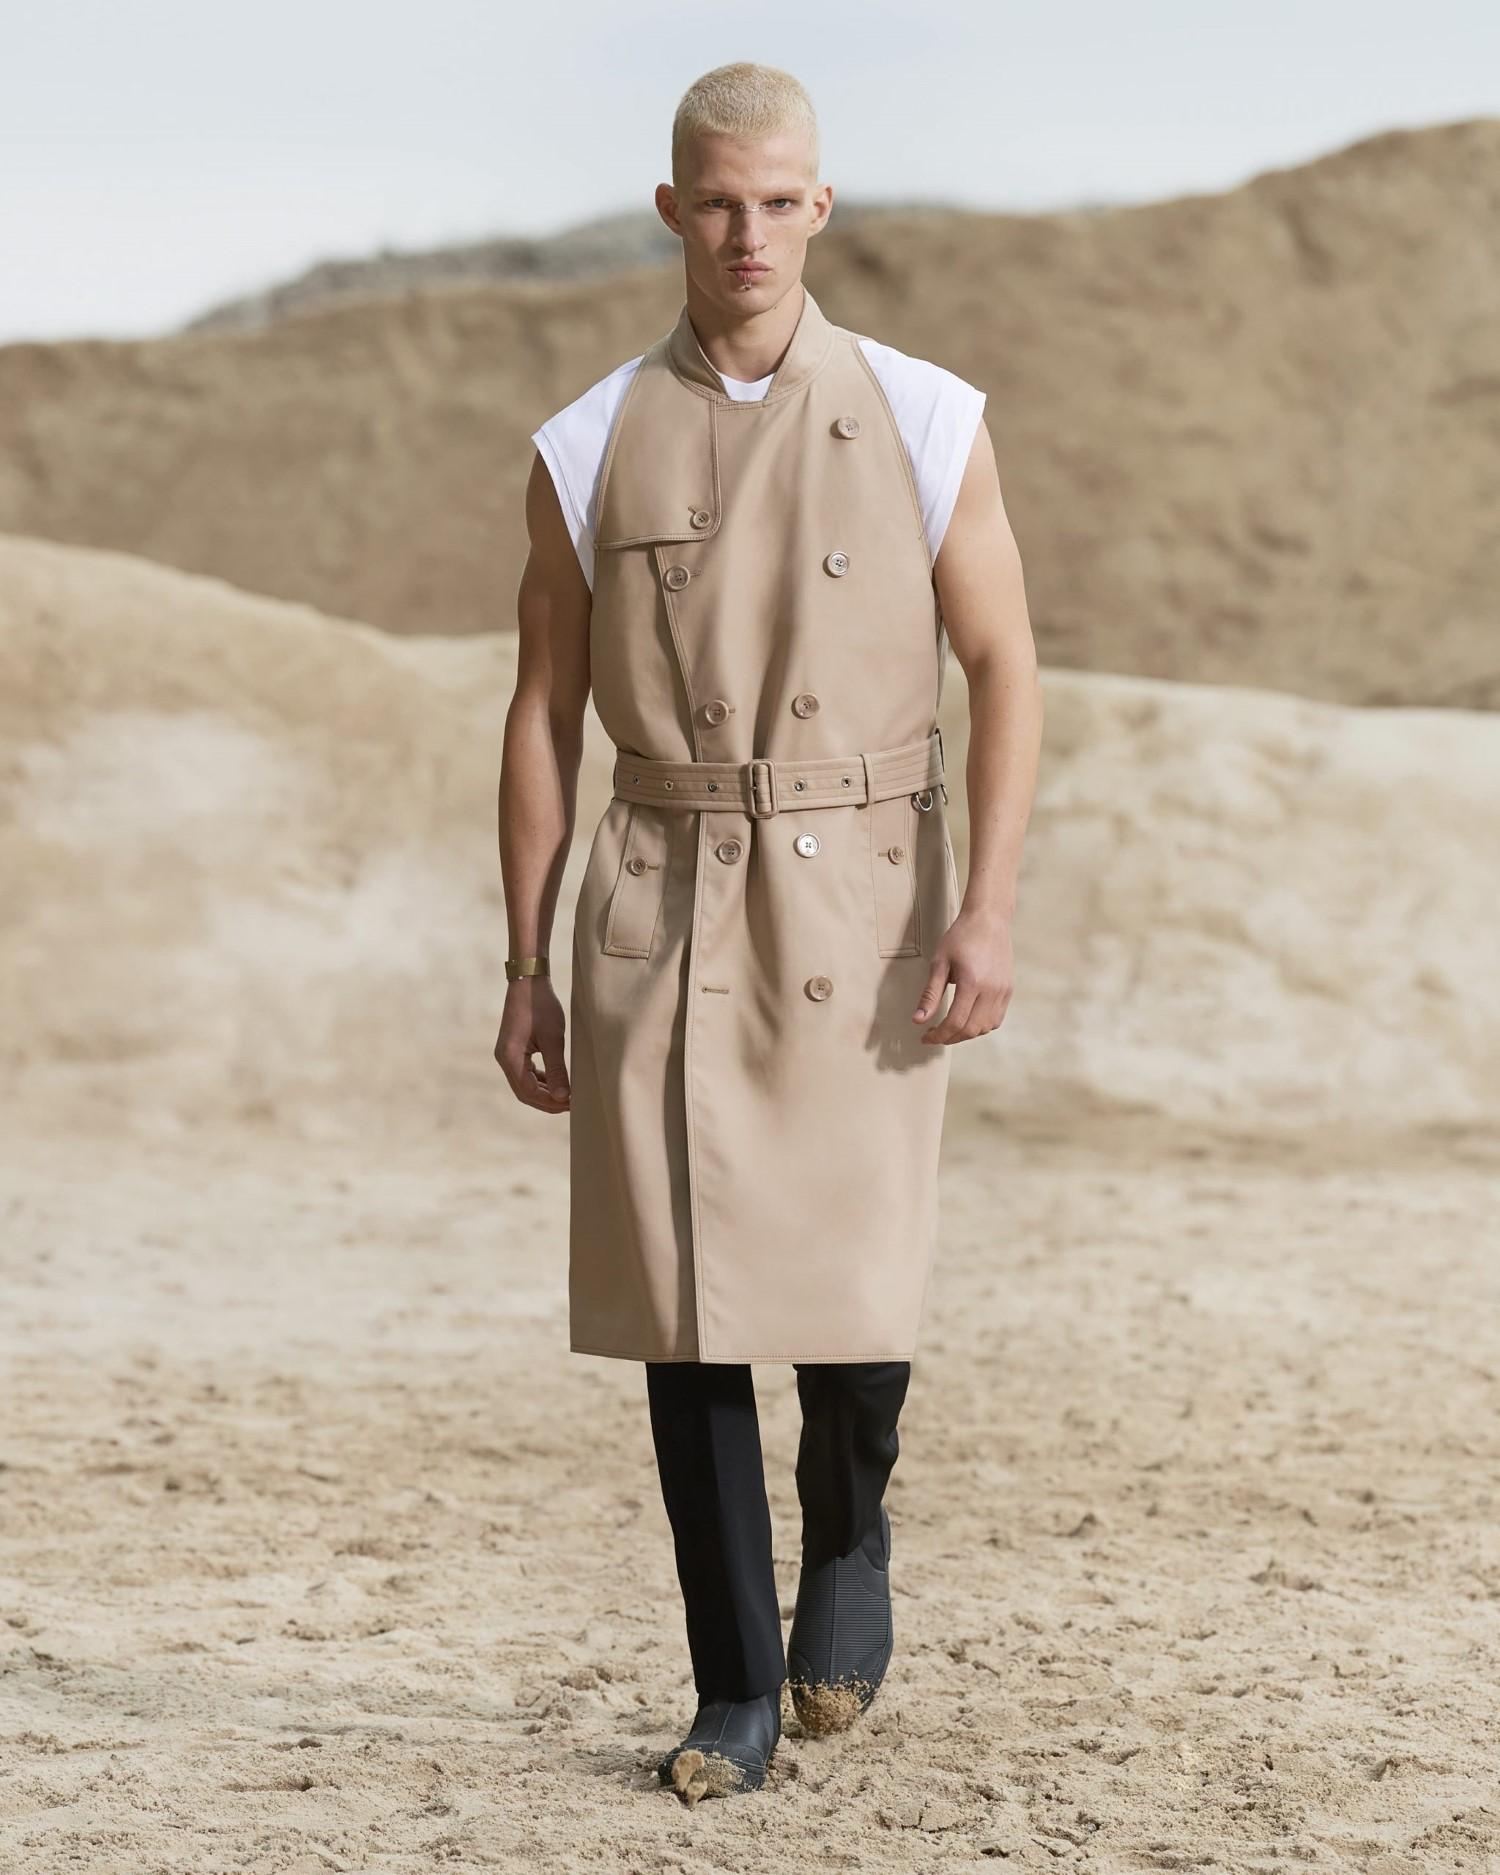 Burberry Spring Summer 2022 - Paris Fashion Week Men's